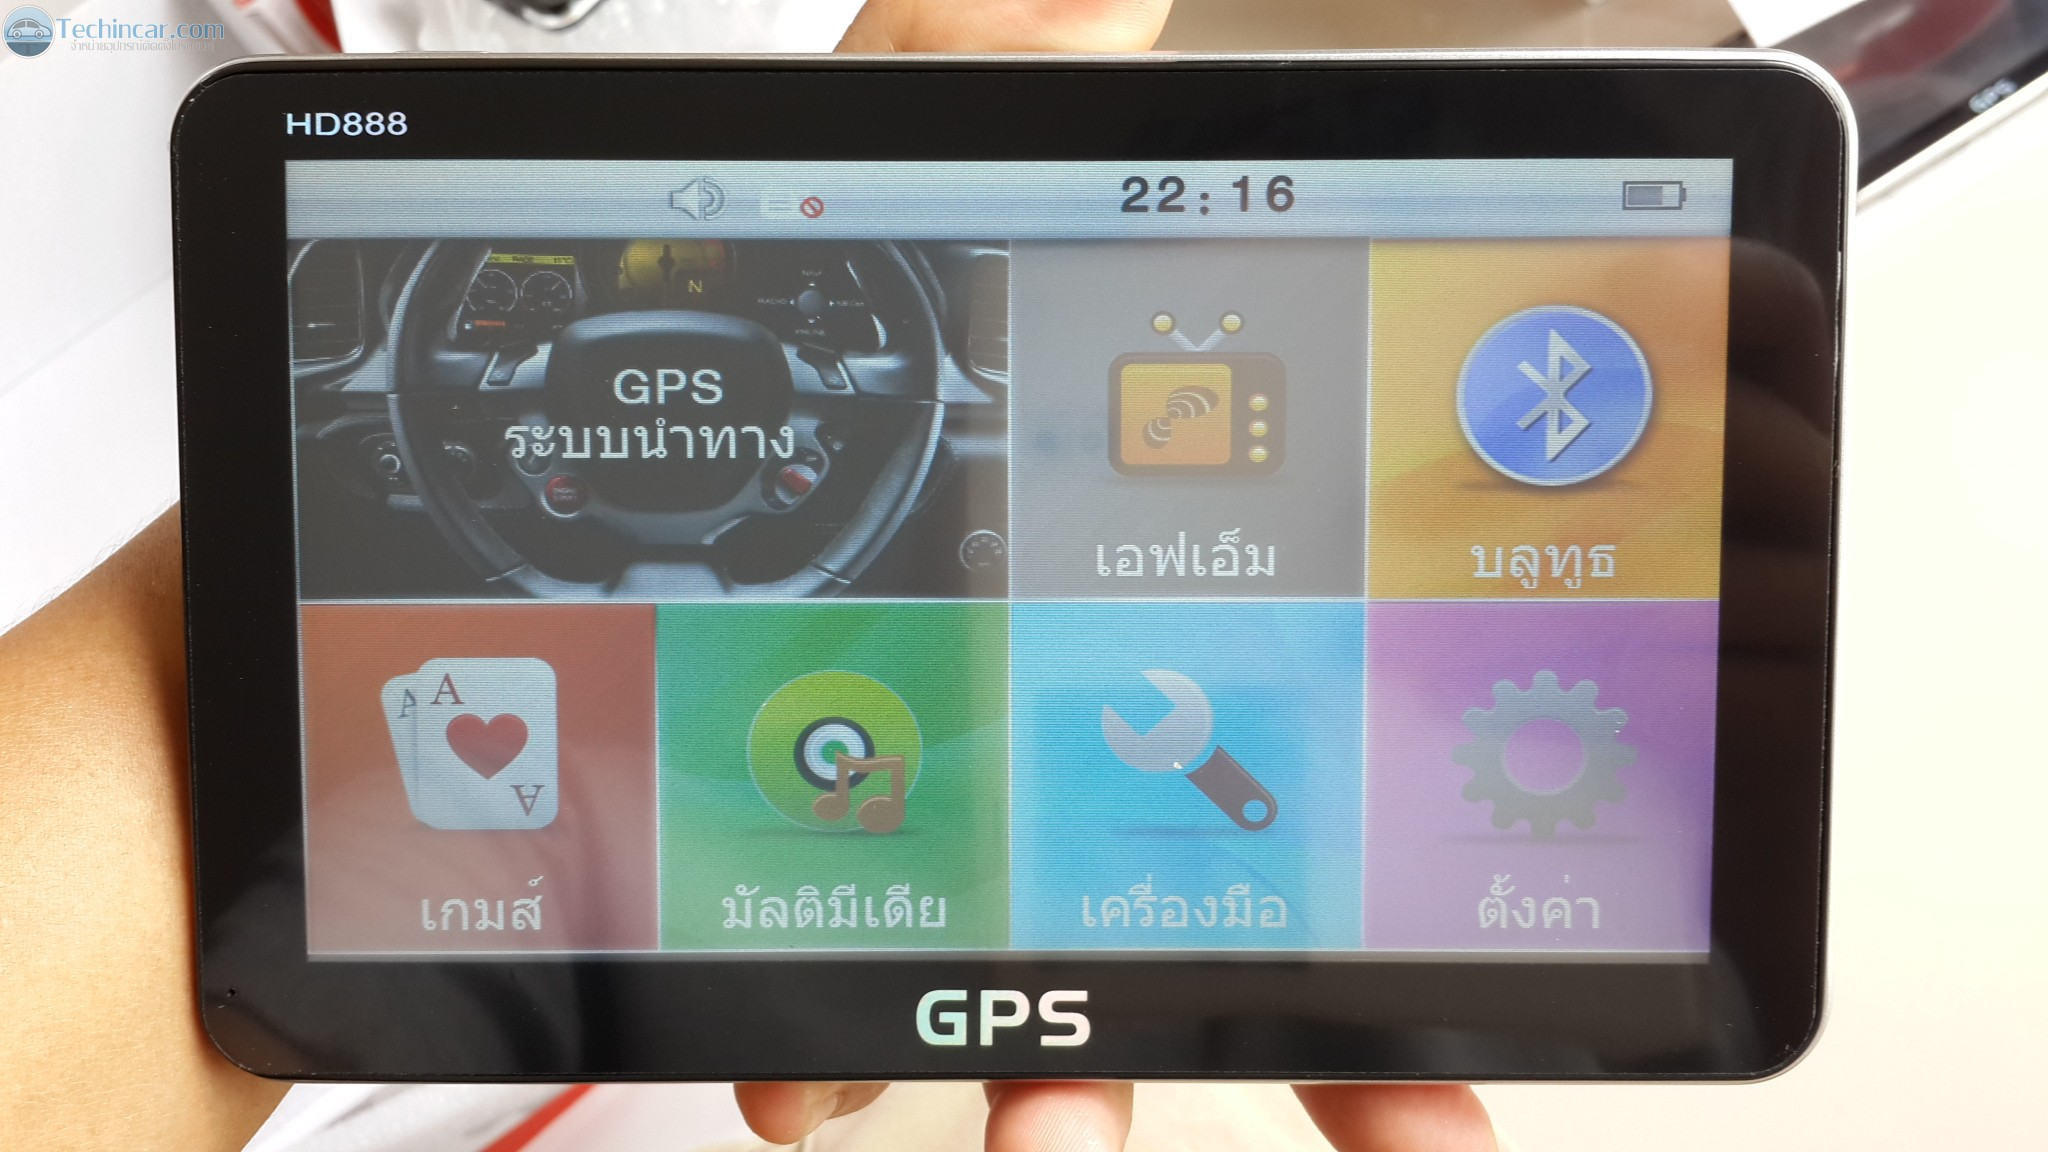 GPSนำทาง เทคอินคาร์หน้าจอ 7 นิ้ว HD888